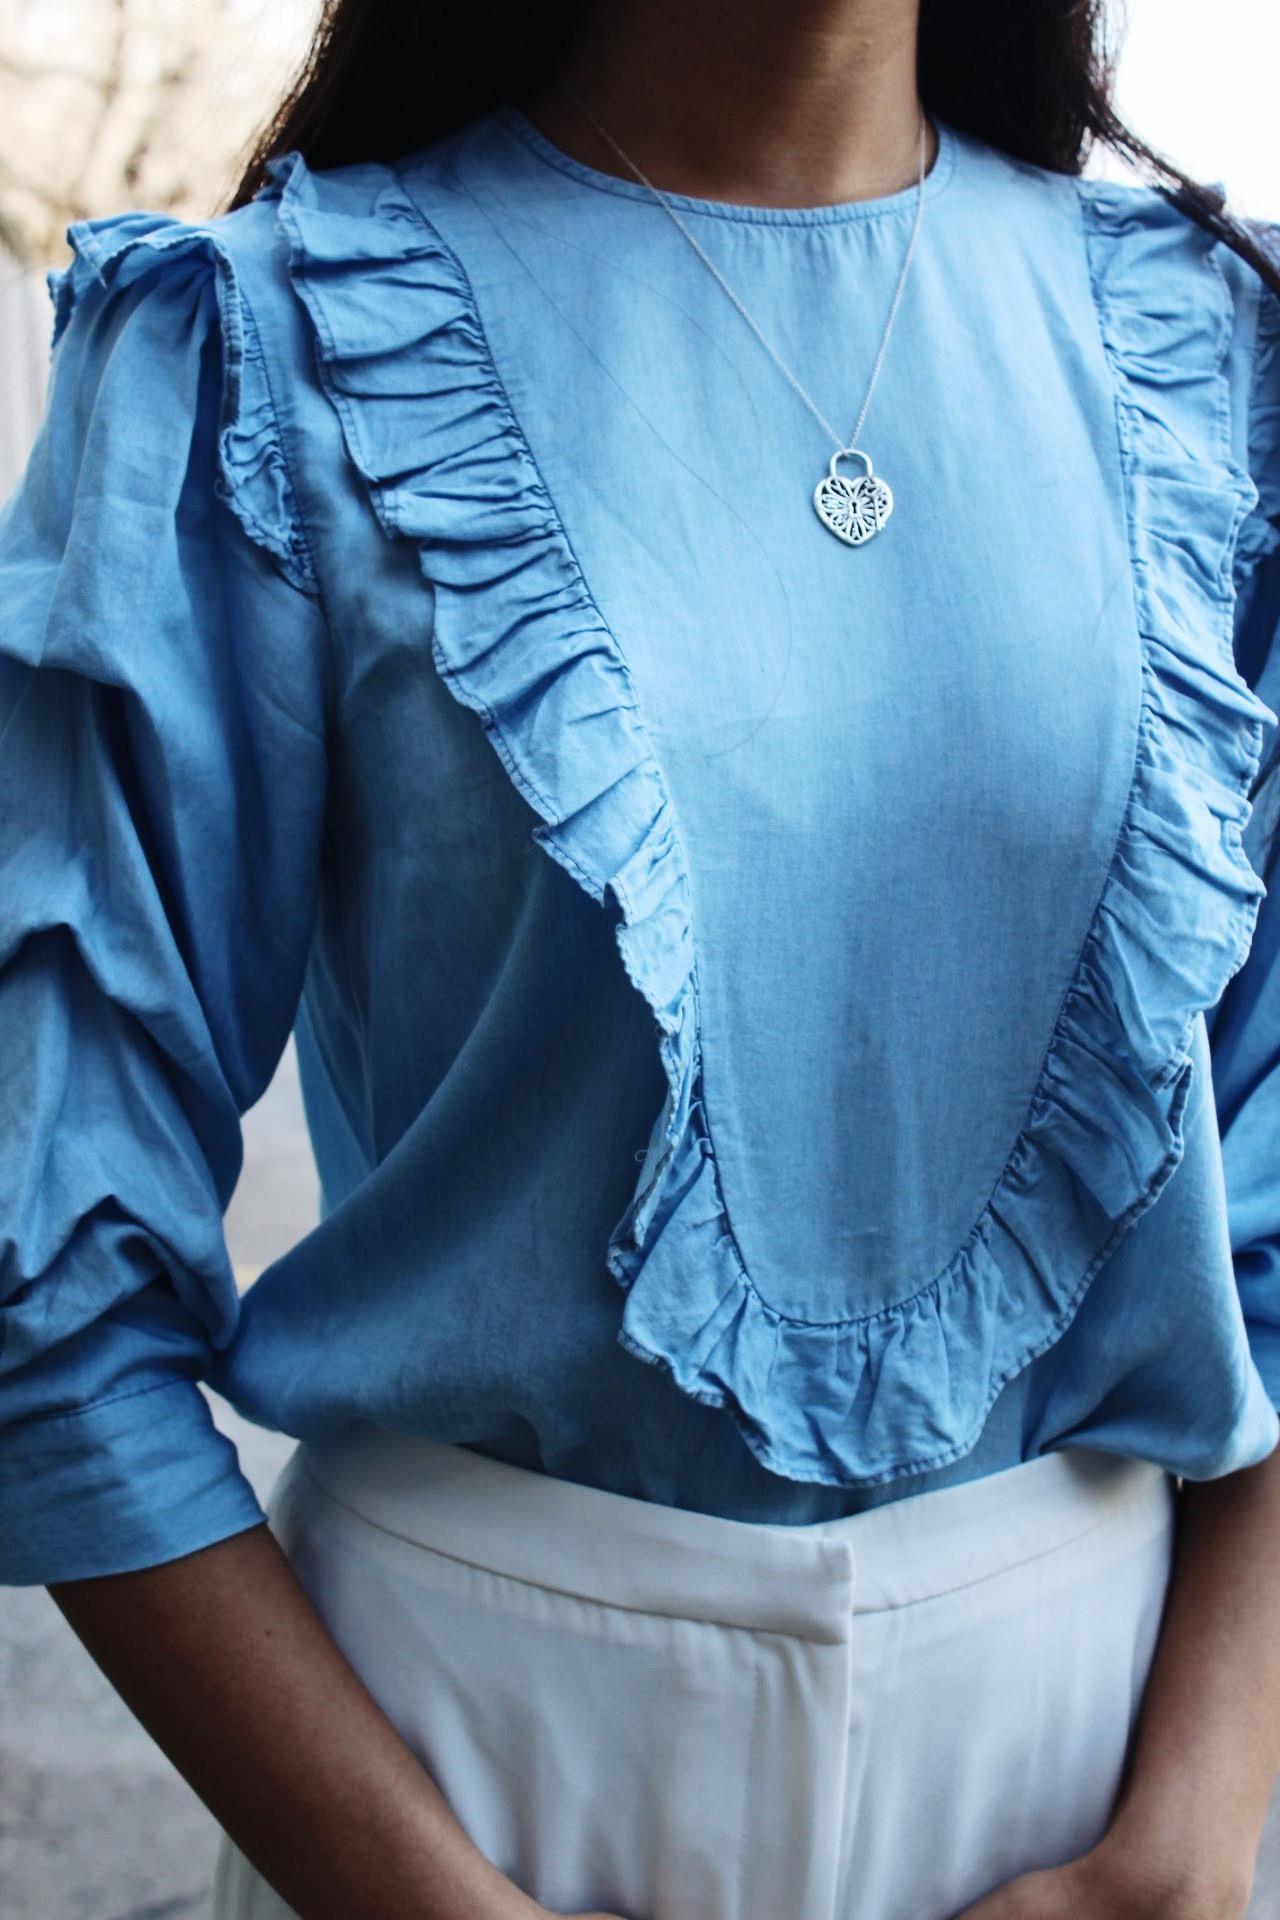 Nicole, Tiffany & Co necklace, blue ruffle shirt, FashionHumber, Campus street style, fashion, student, Humber College